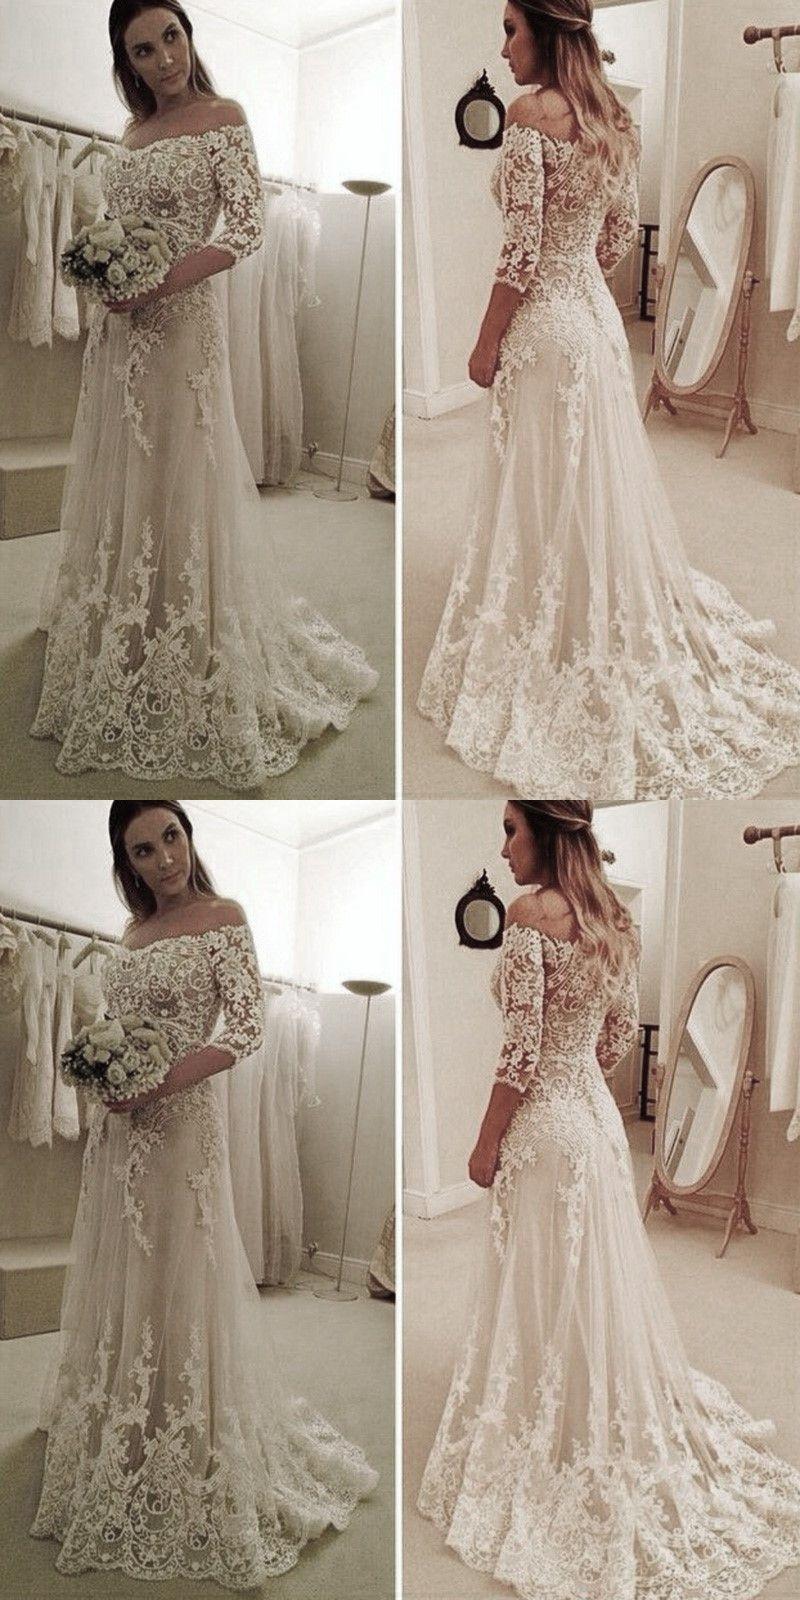 Elegant Illusion Neck Wedding Dresses With Lace Train Wedding Tulle Wedding Dress Wedding Dresses Lace Perfect Wedding Dress [ 1600 x 800 Pixel ]